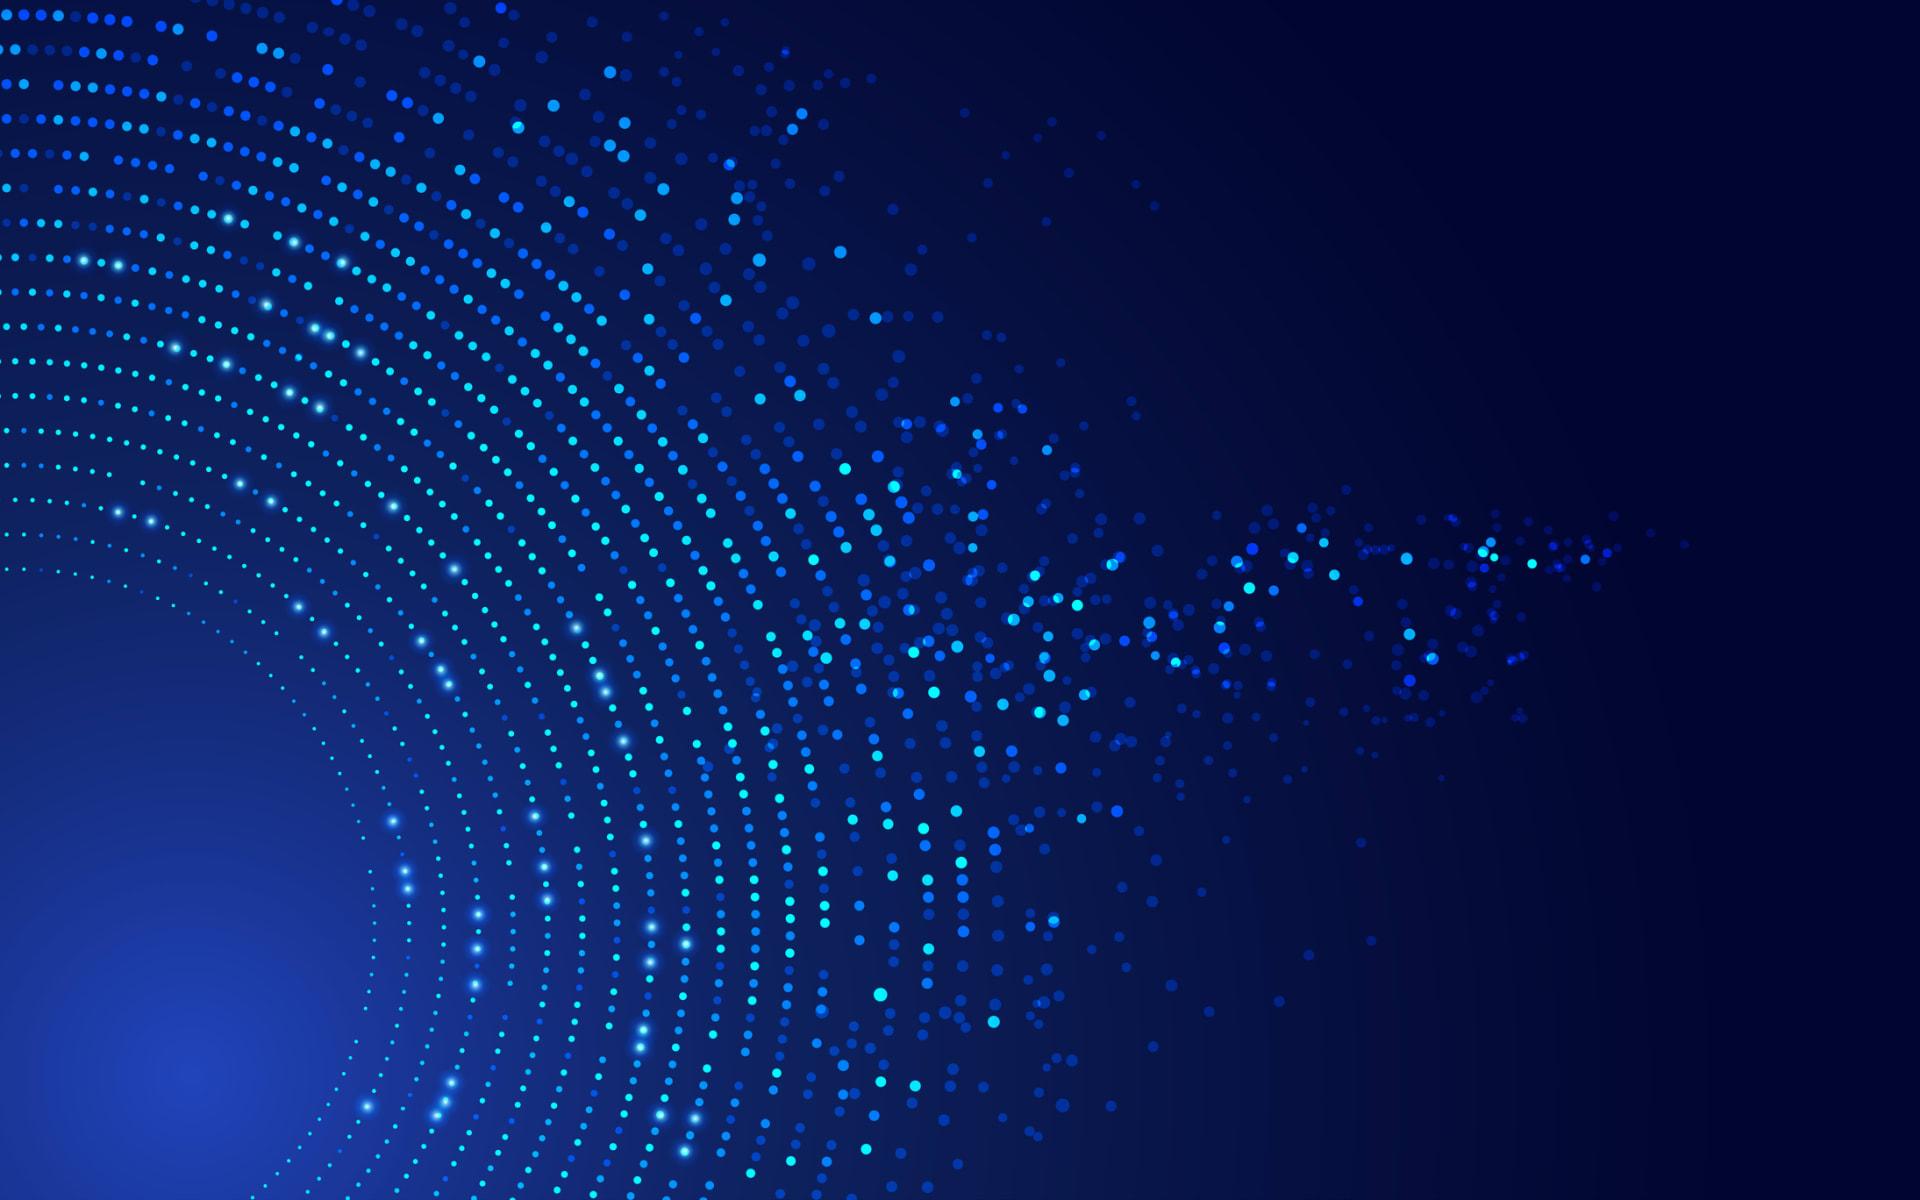 circles on blue computer screen